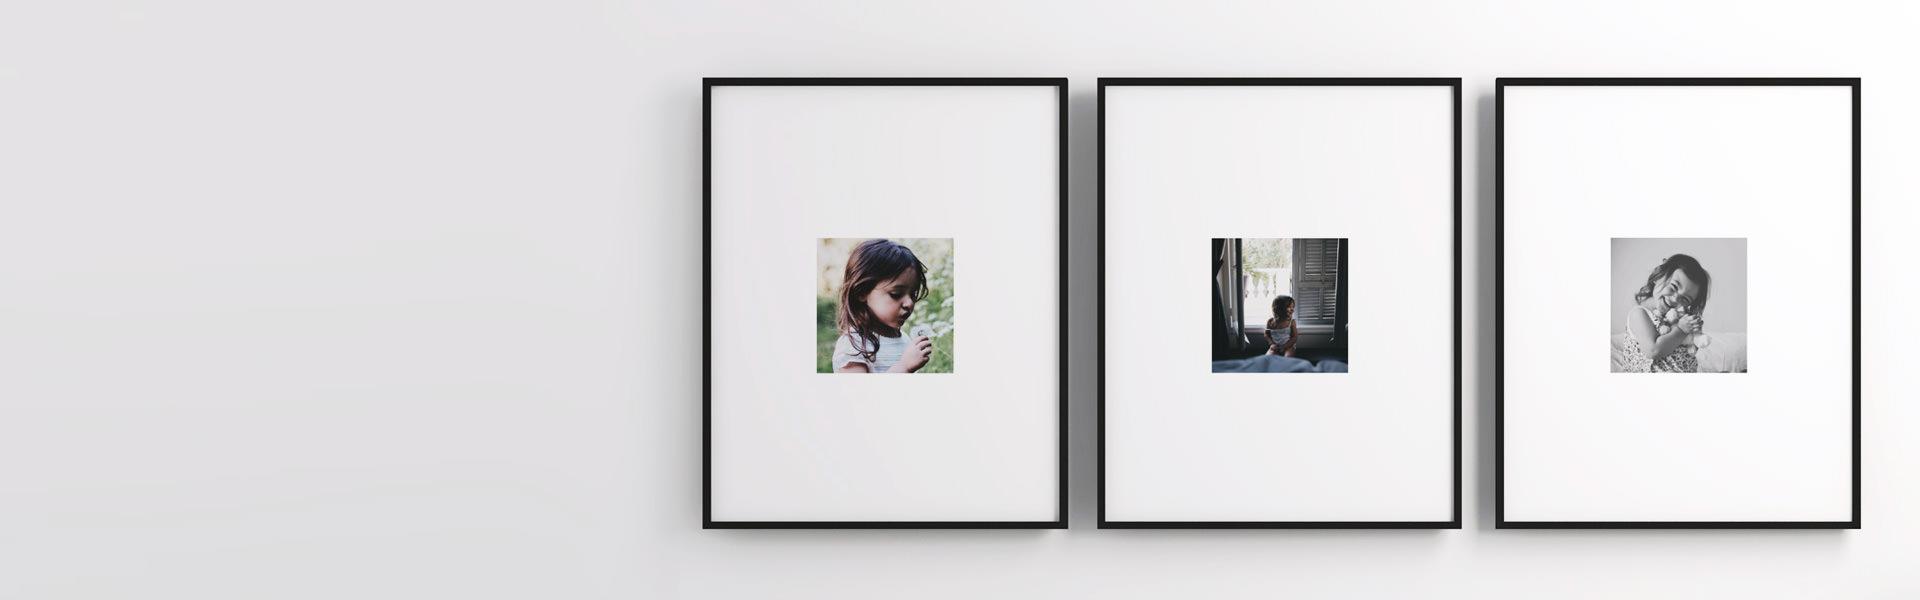 Gallery Framed Prints